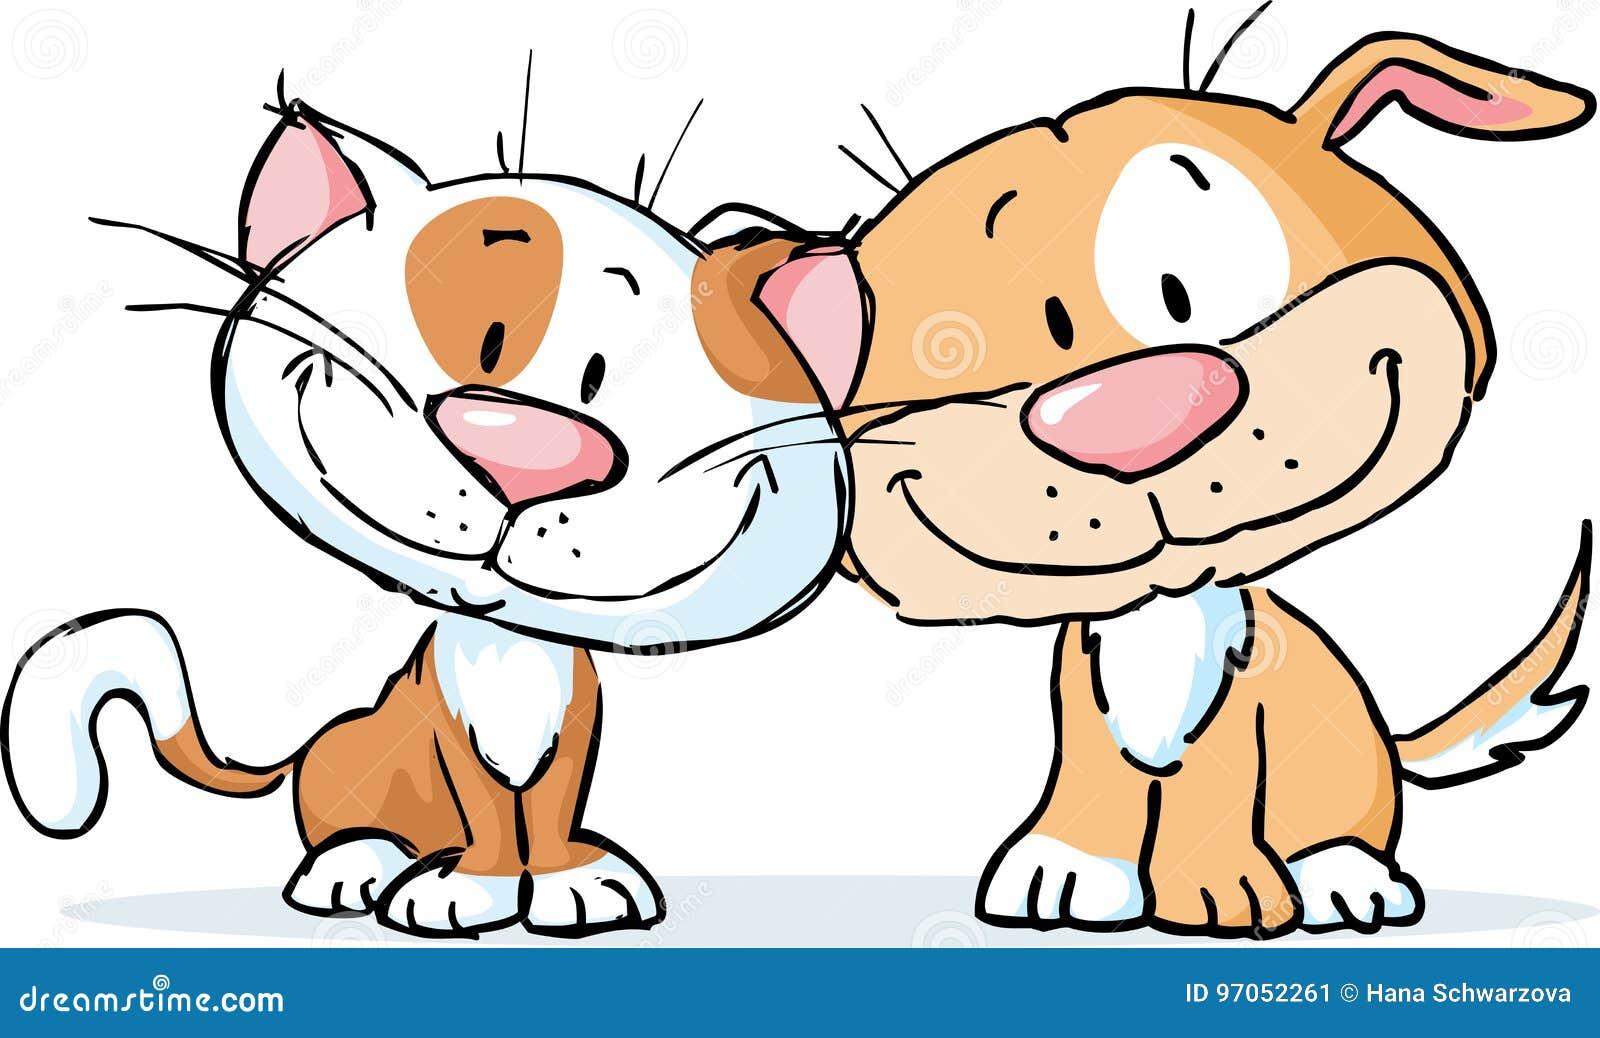 Cute Dog And Cat Vector Illustration Cartoon Isolated Stock Vector Illustration Of Kitten Happy 97052261